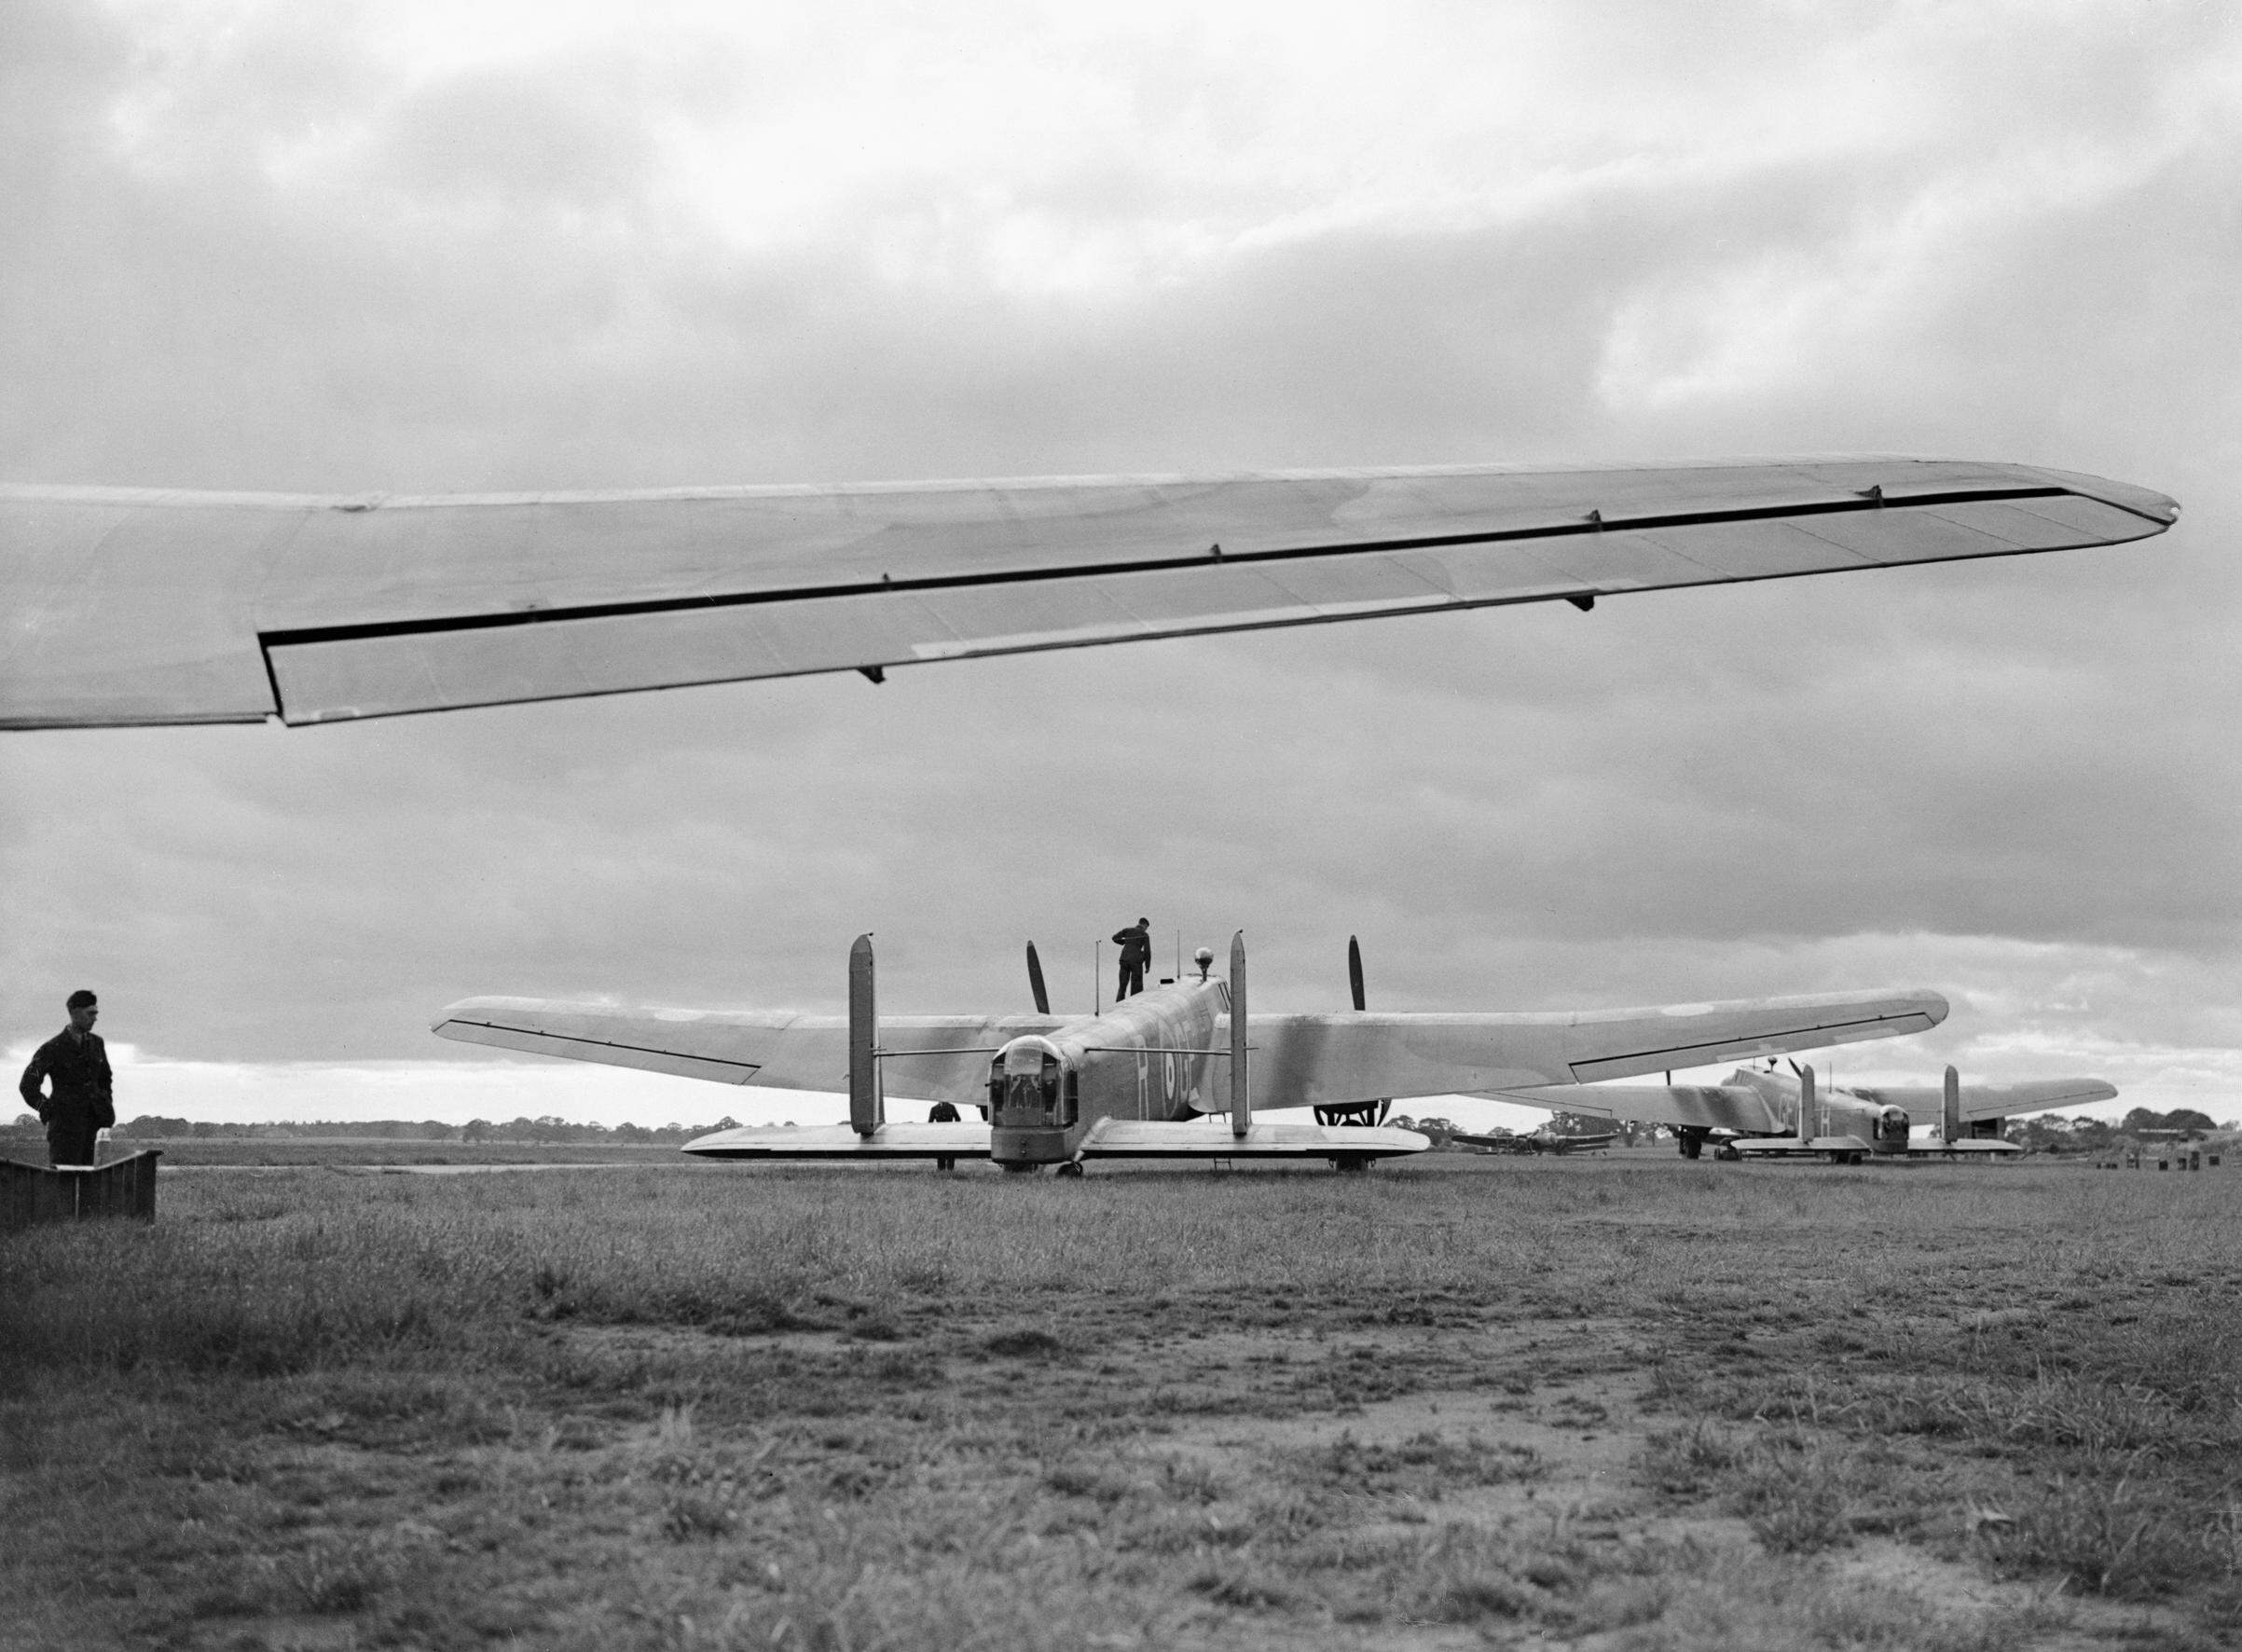 No. 58 Squadron RAF